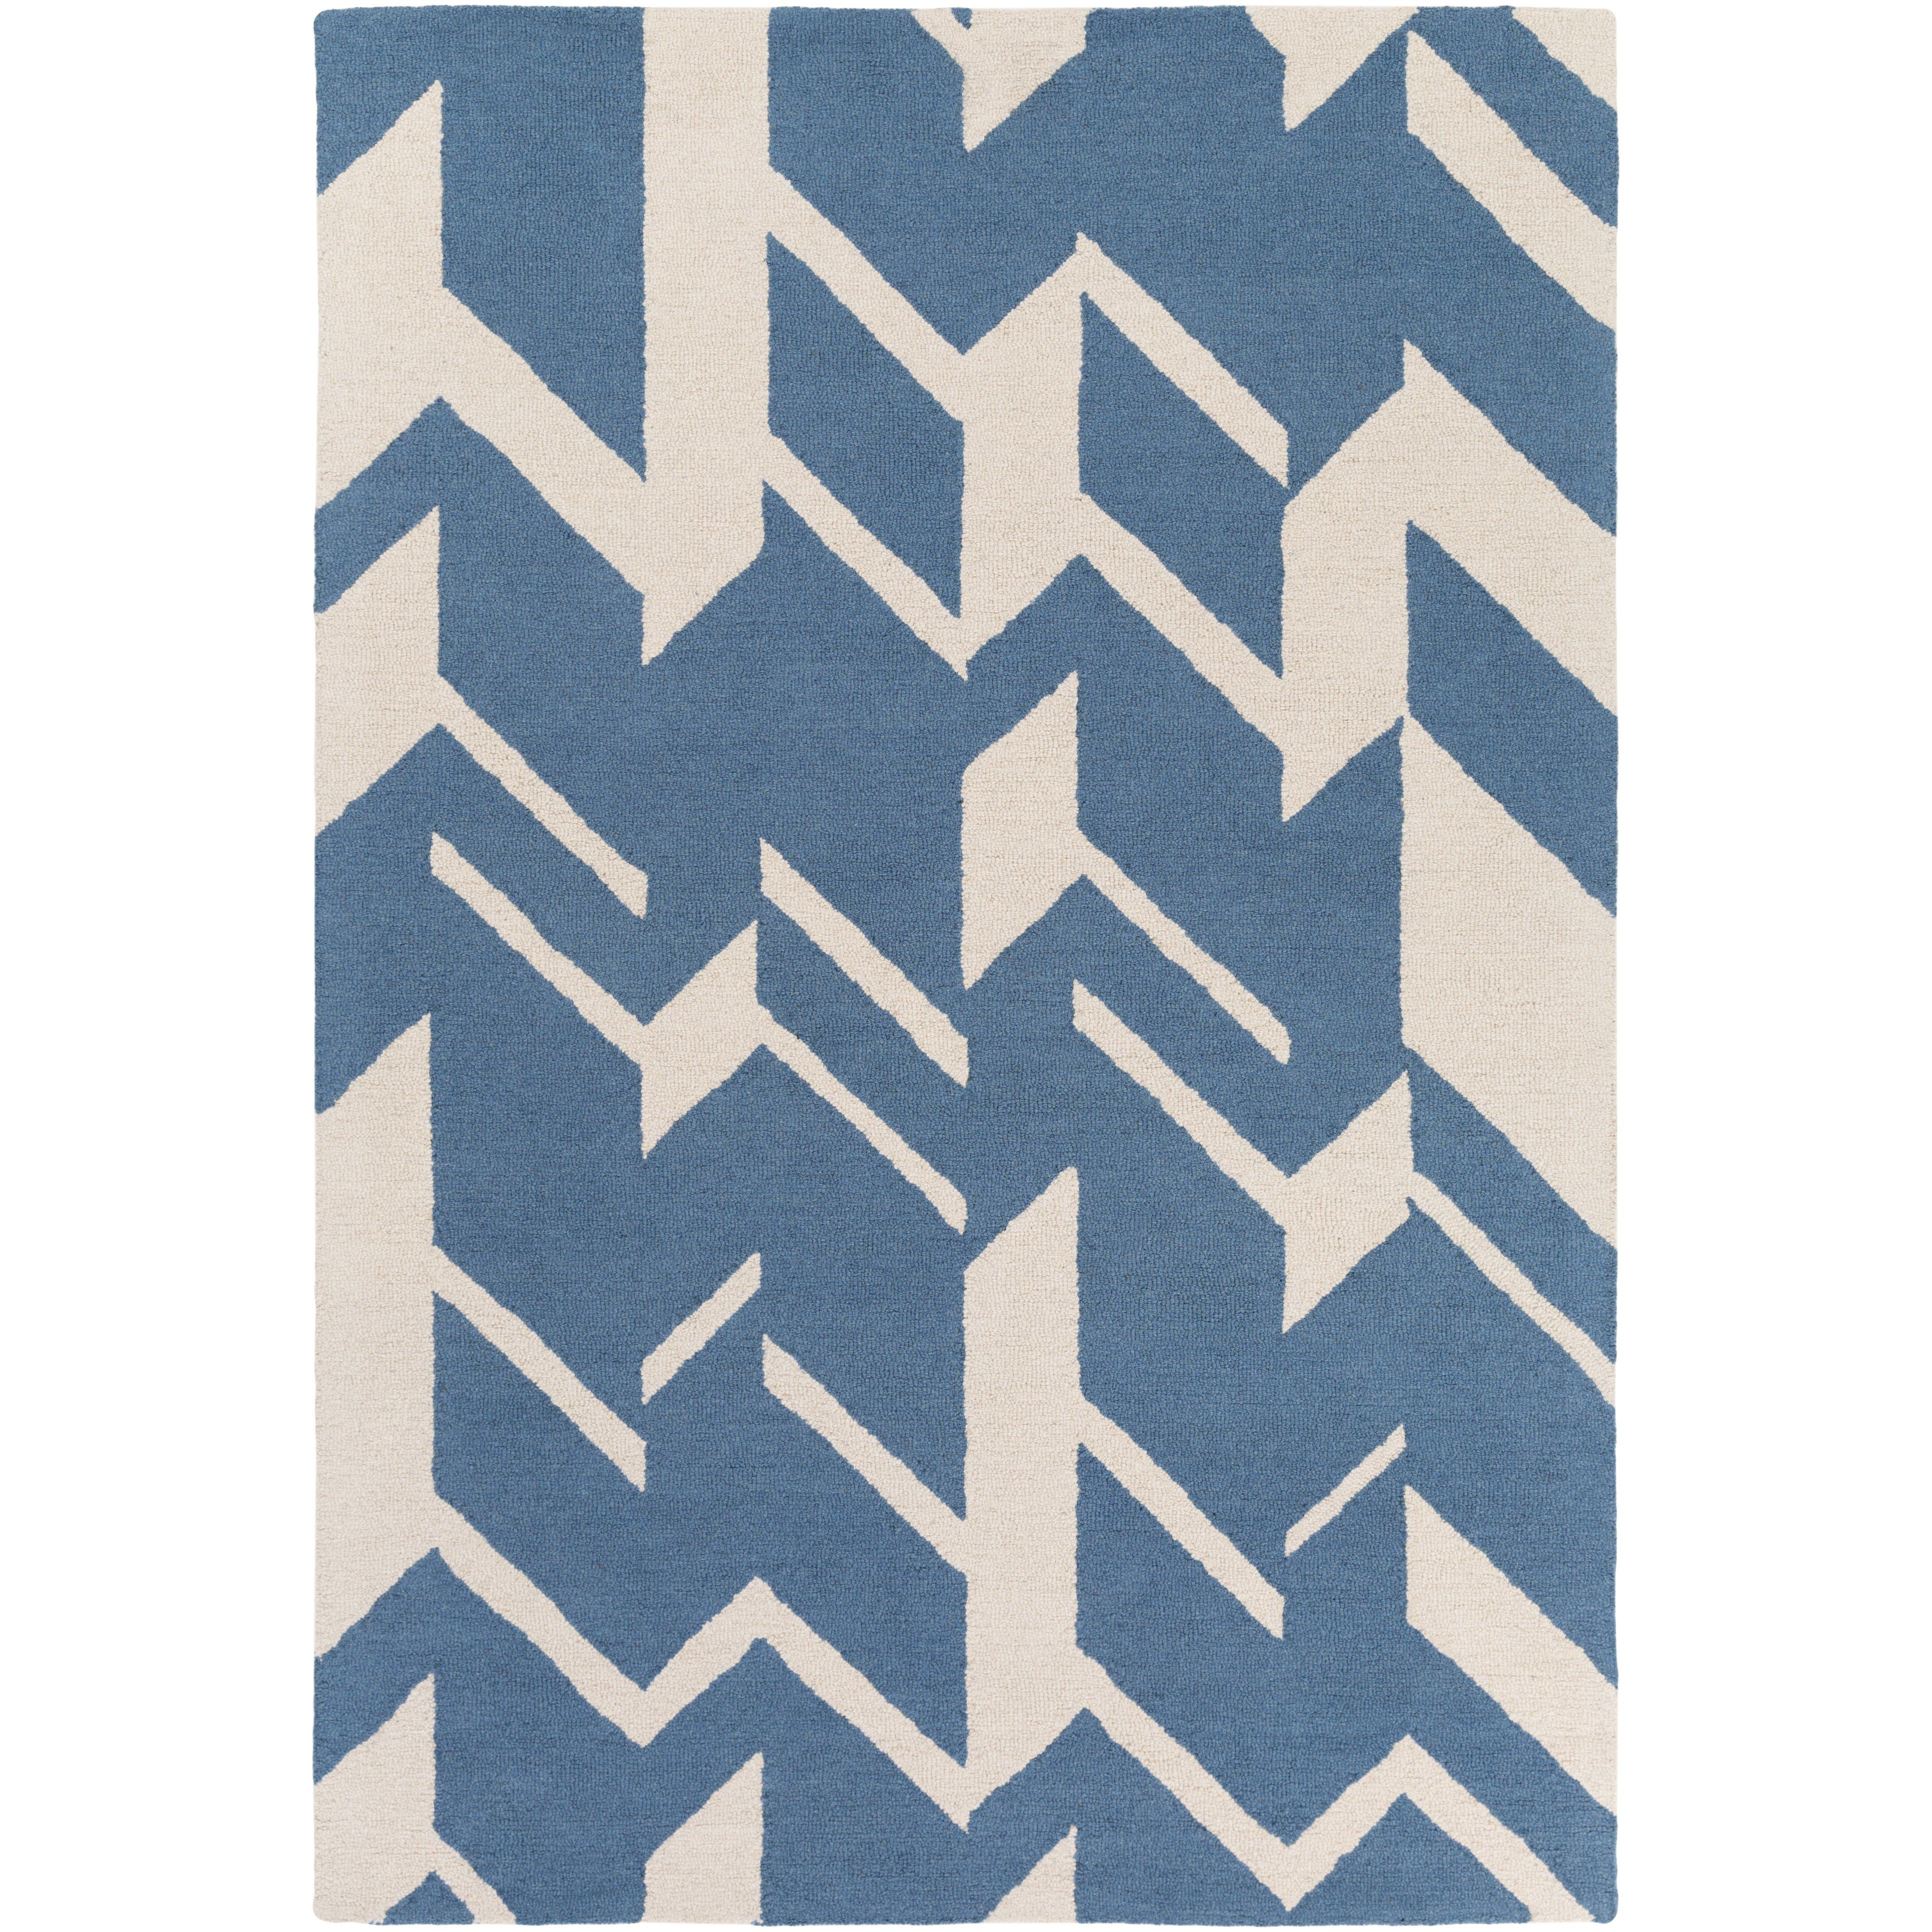 carpet weavers peoria il – Meze Blog